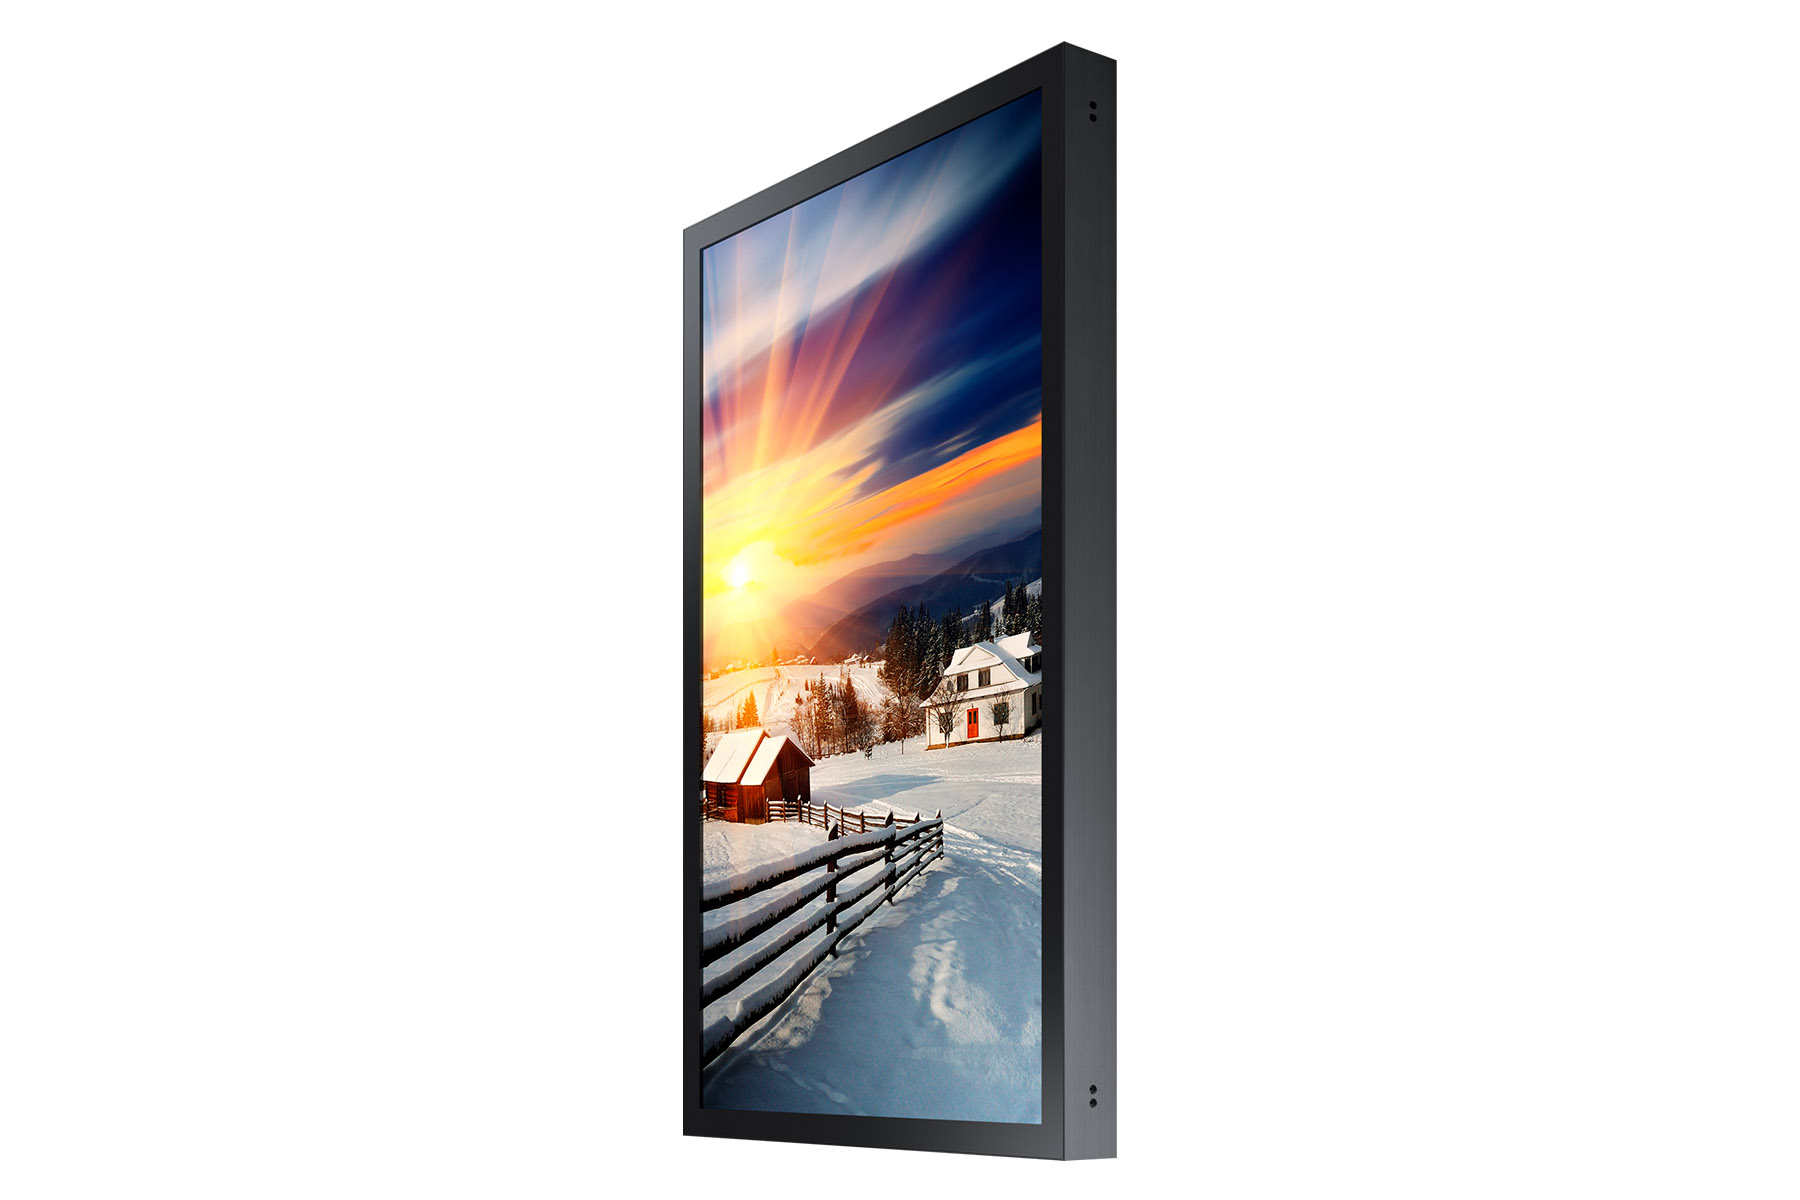 85 zoll lcd outdoordisplay samsung oh85f neuware kaufen. Black Bedroom Furniture Sets. Home Design Ideas